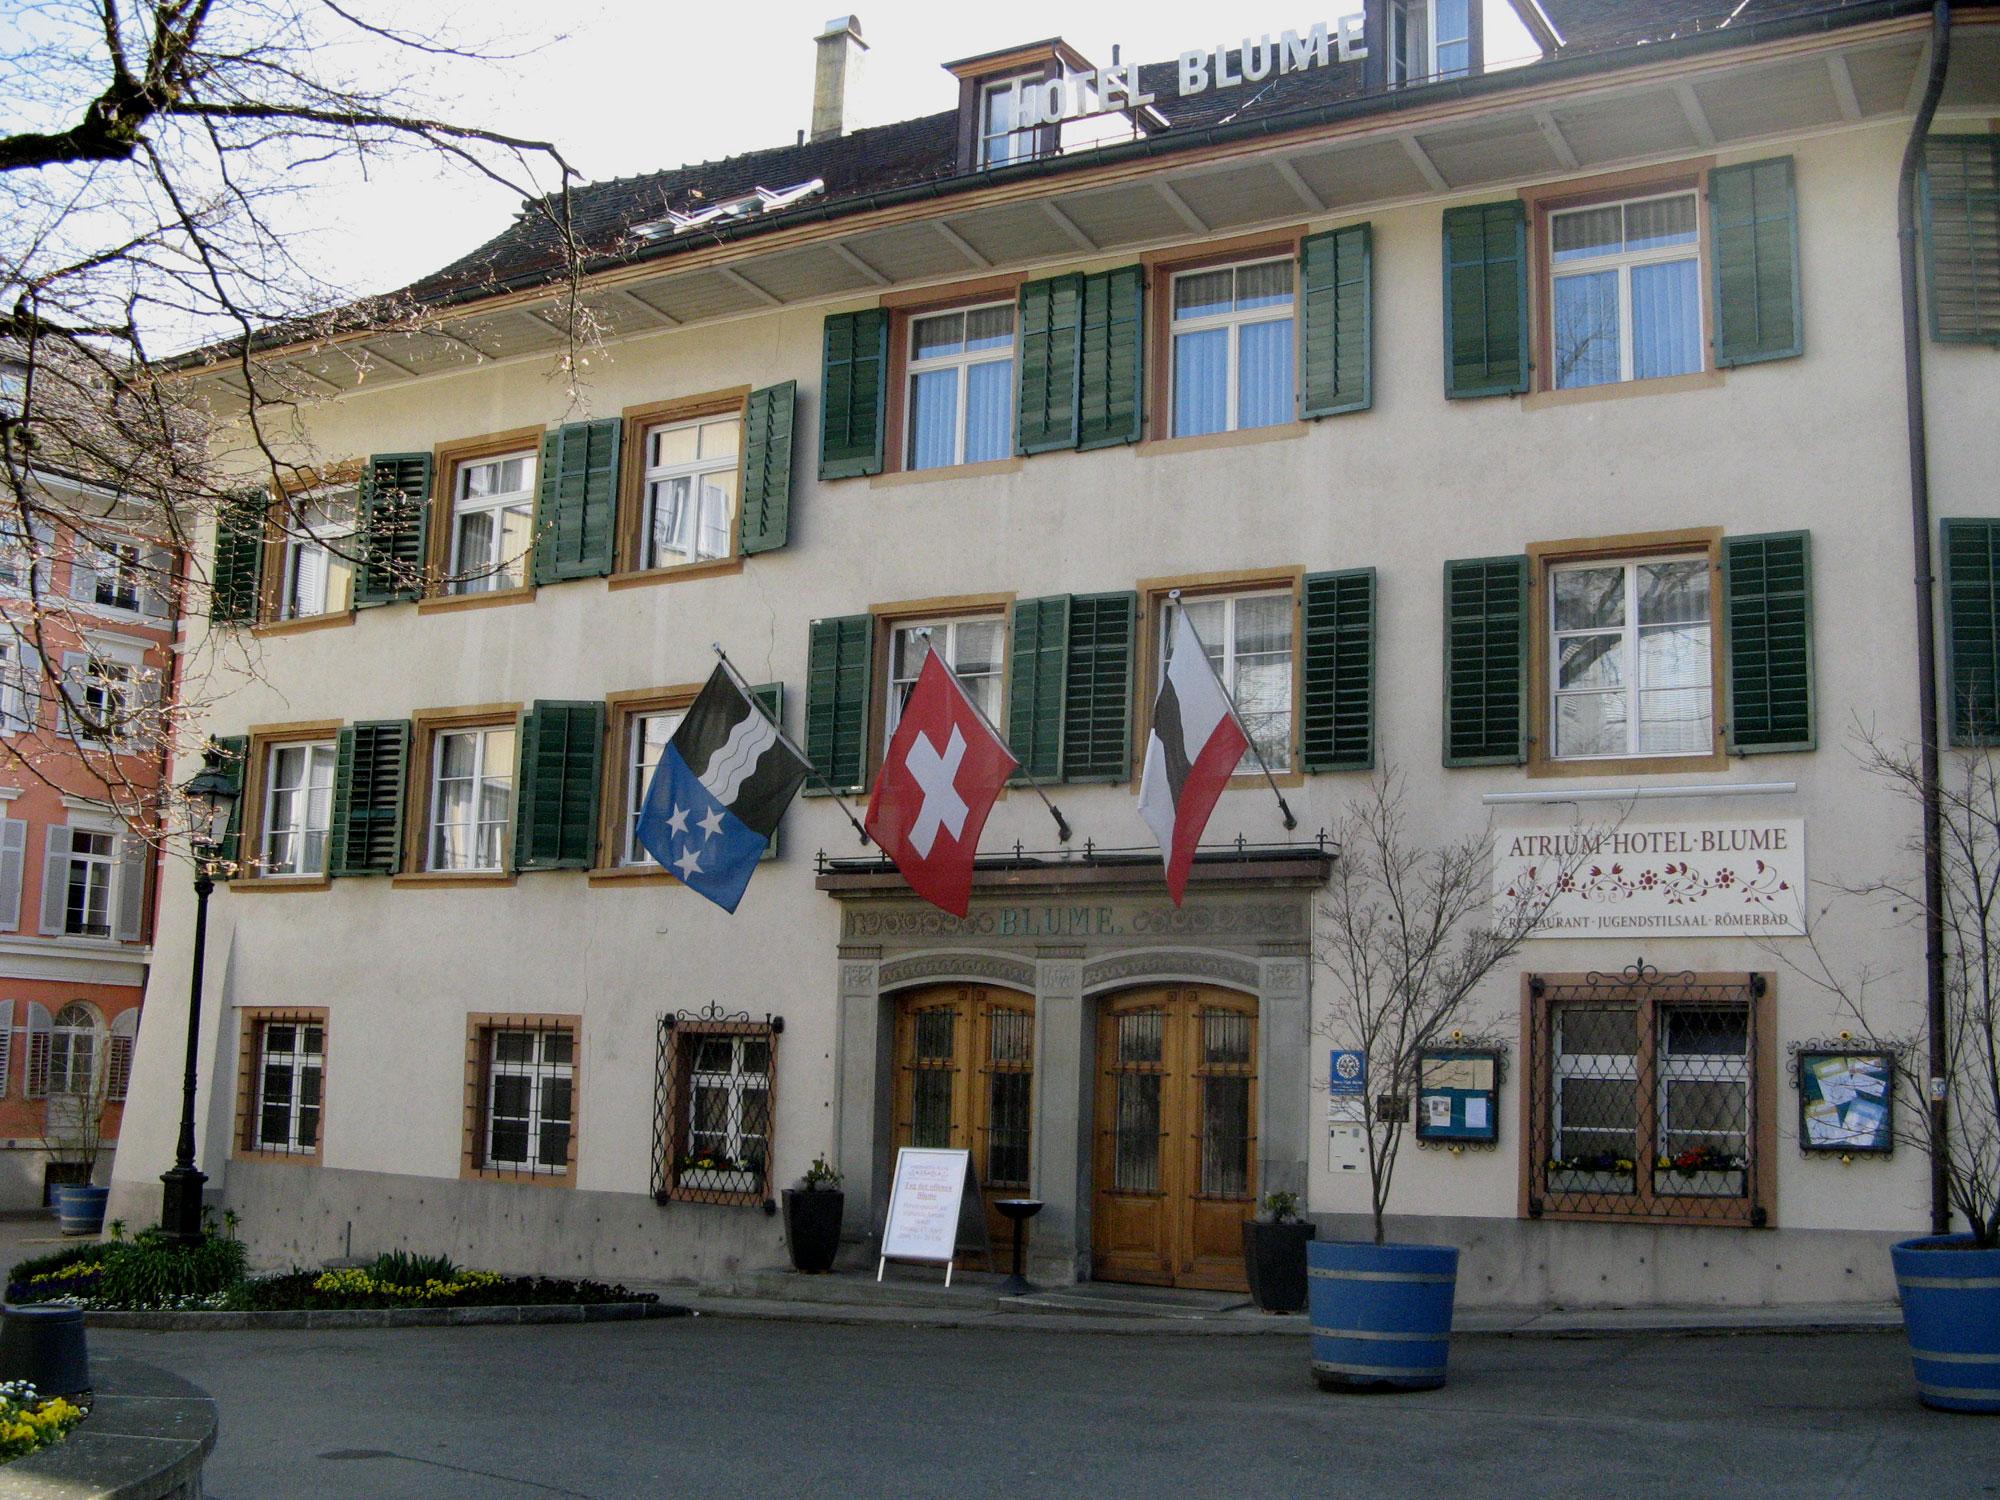 Hotel Blume Wikipedia